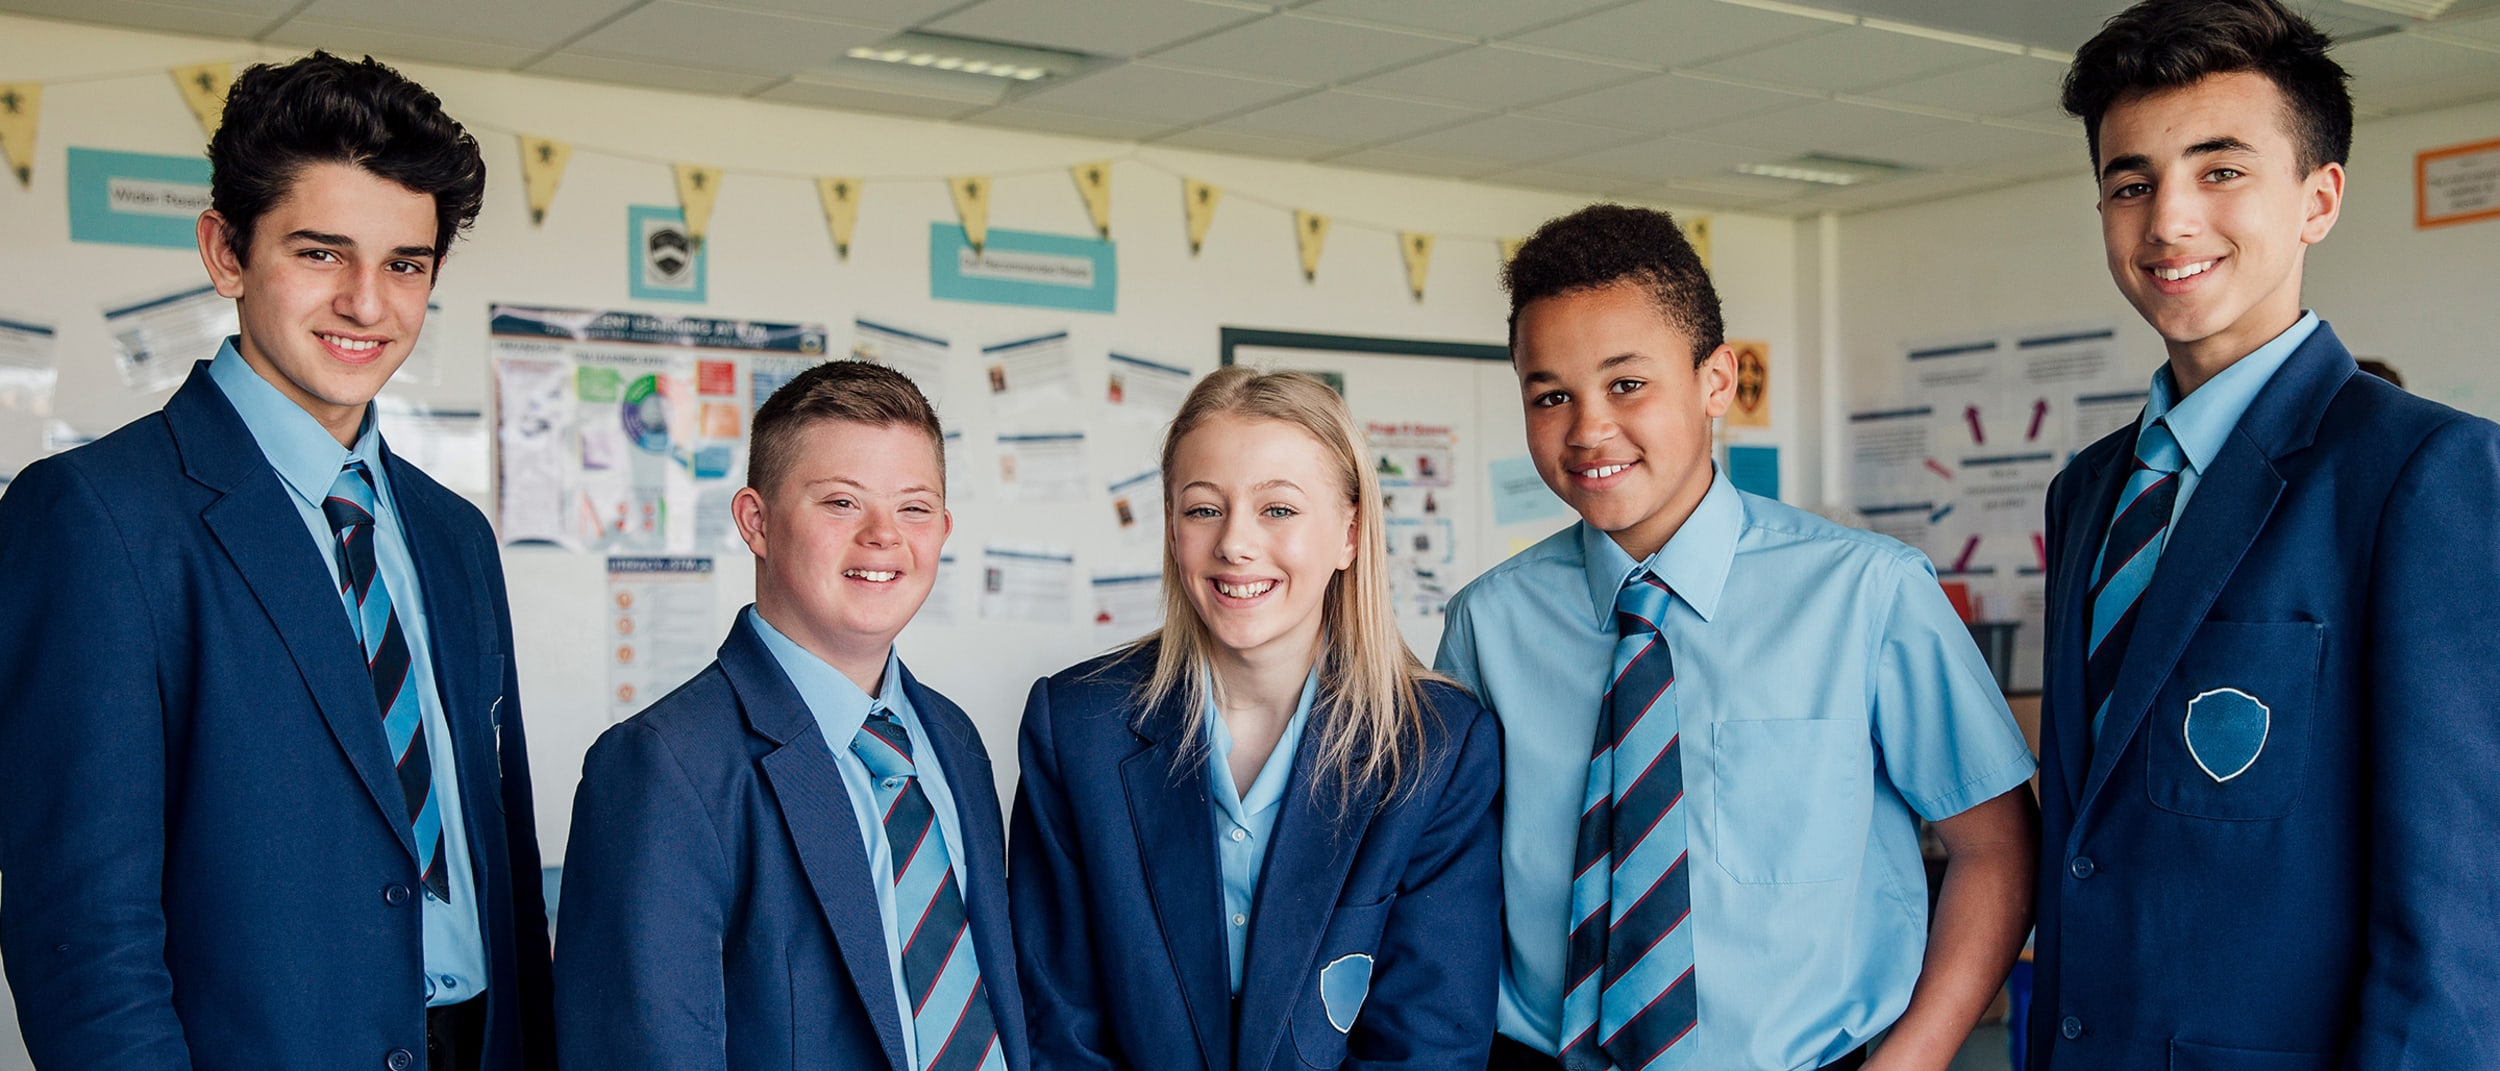 Looksmart: 30% off* school uniform alterations and repairs